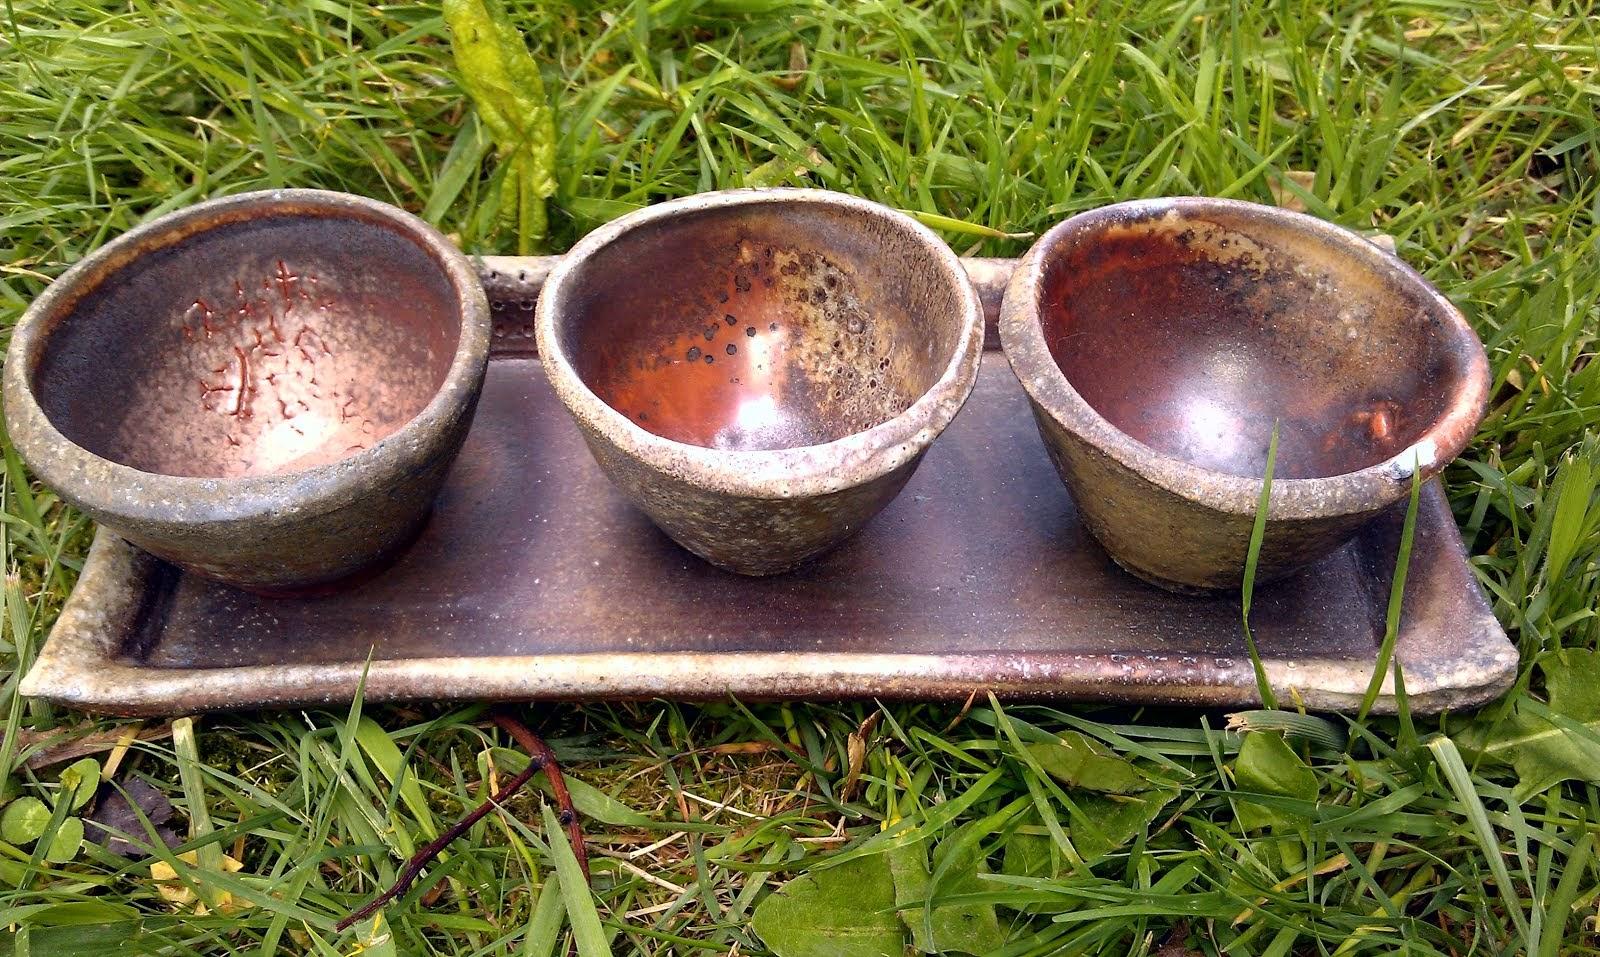 Sauce bowls w/tray